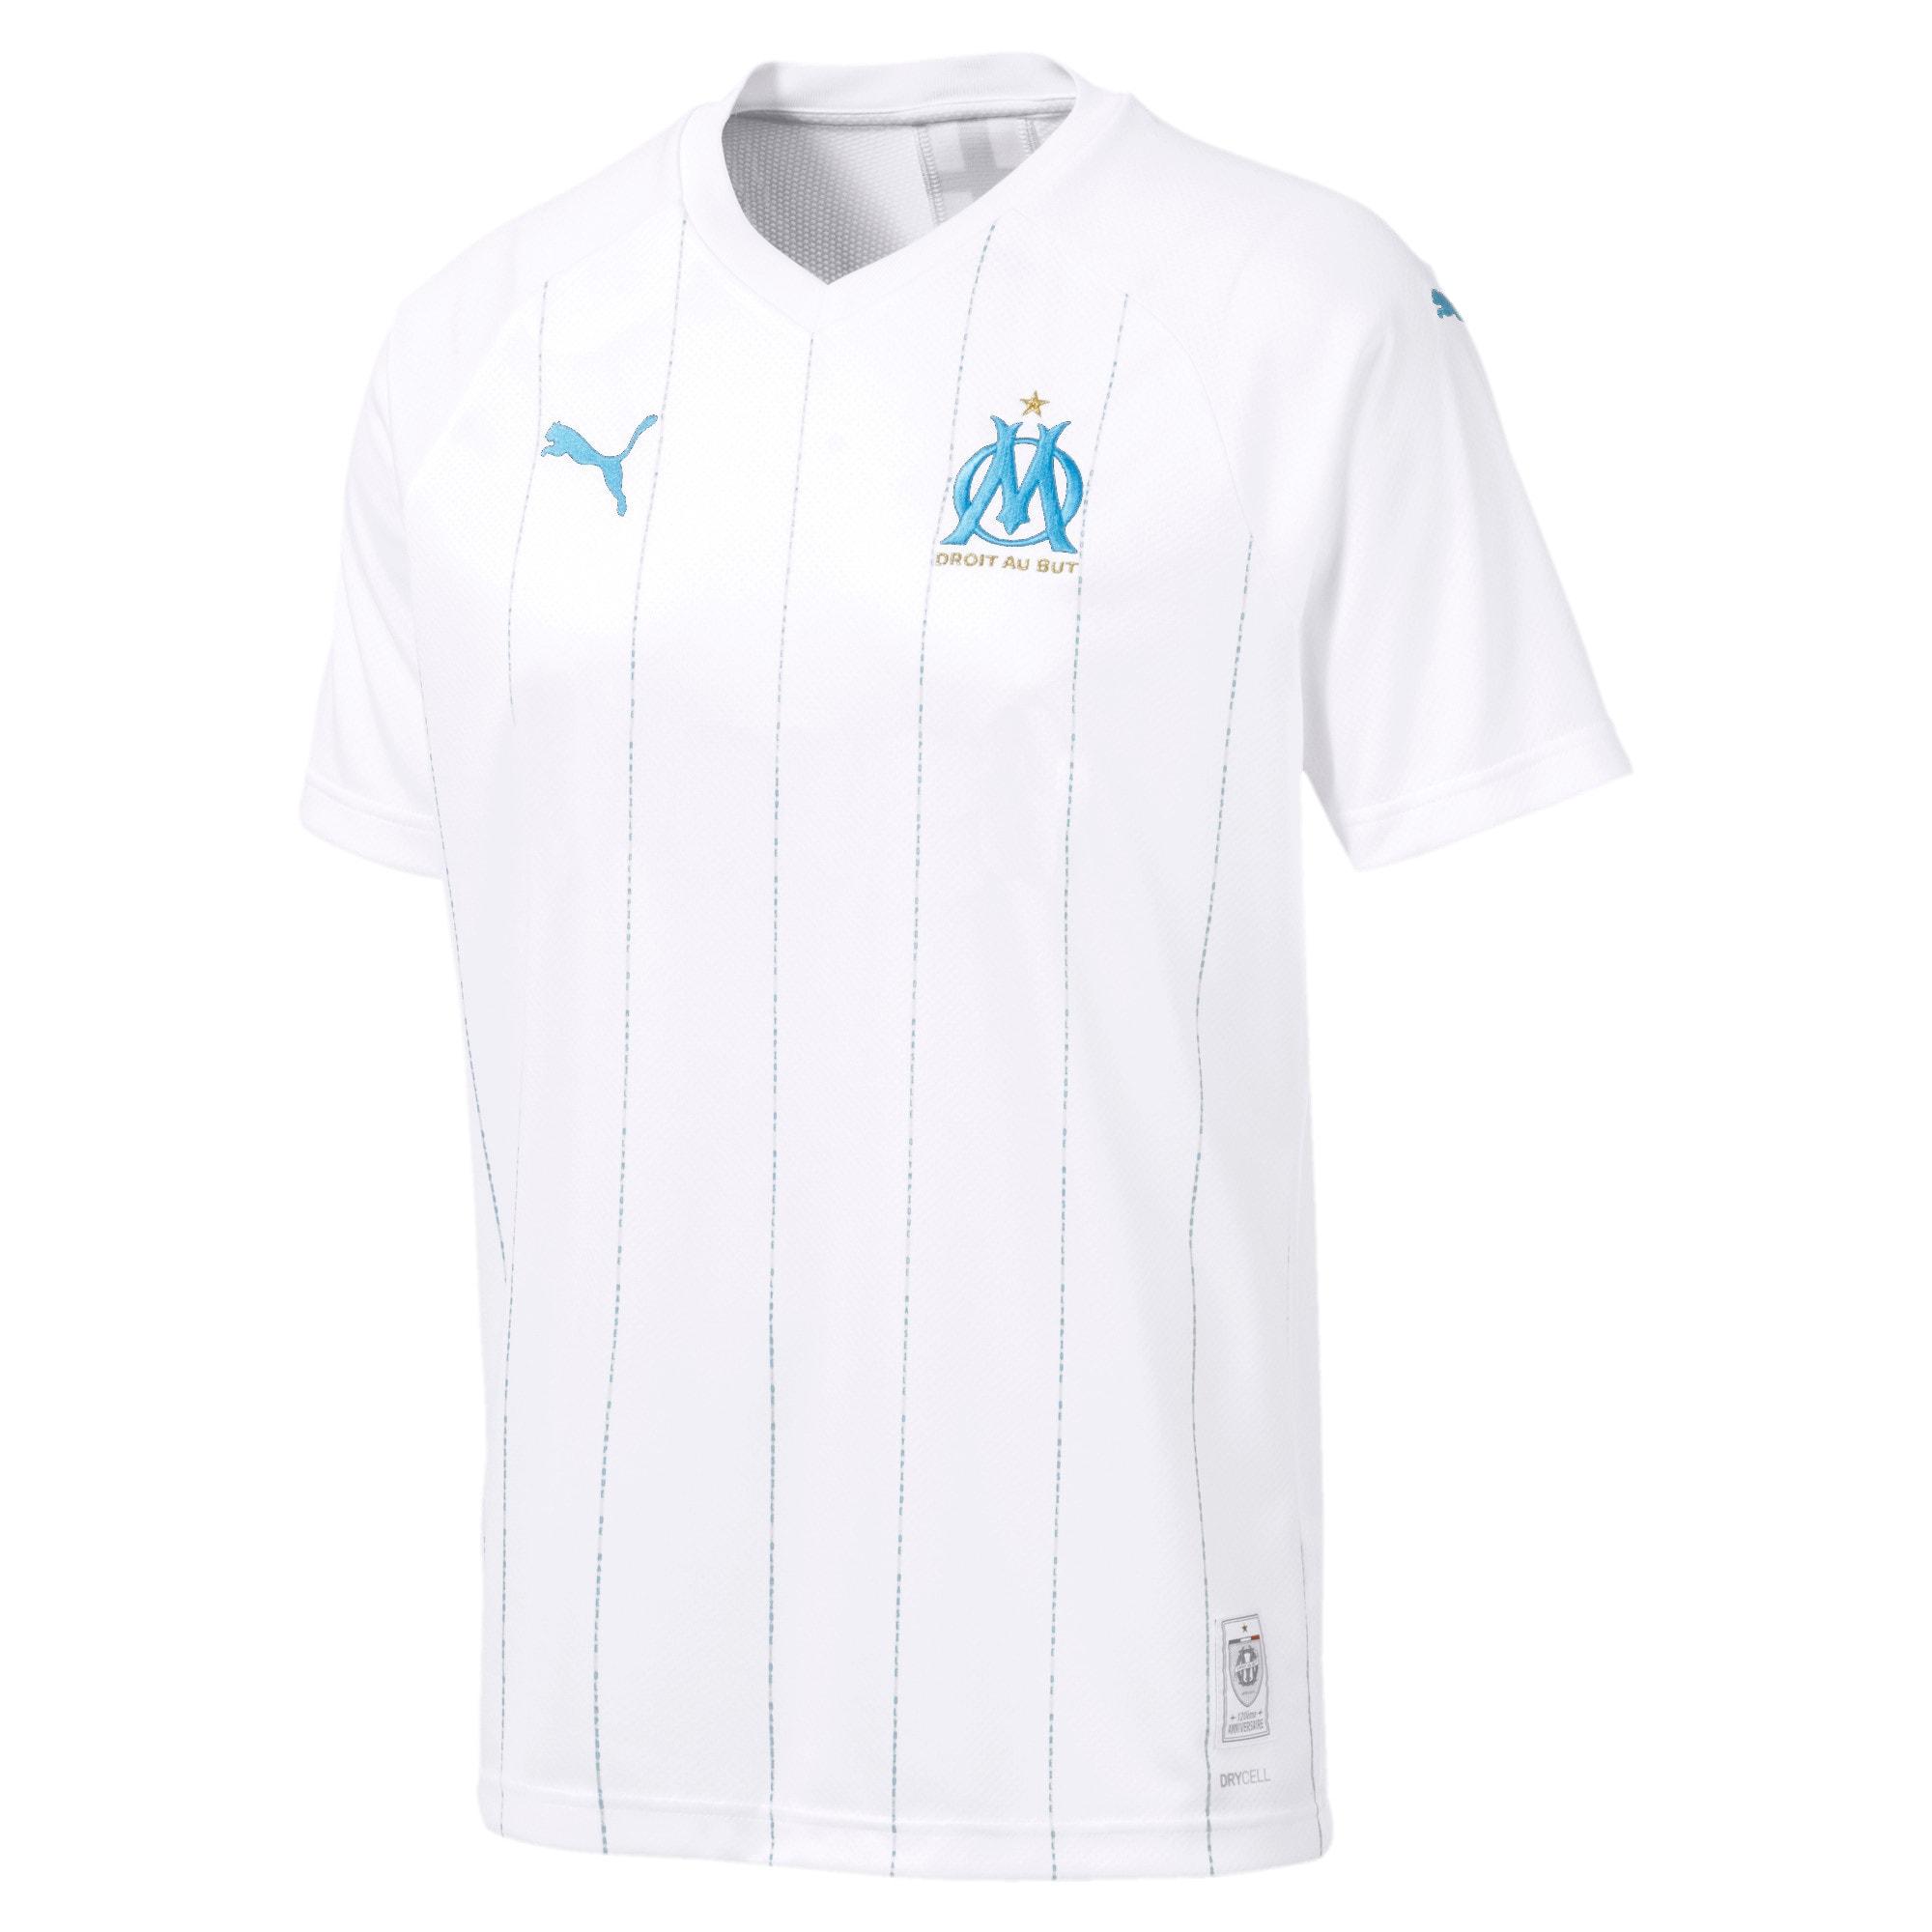 Thumbnail 4 of Olympique de Marseille Men's Home Replica Jersey, Puma White-Bleu Azur, medium